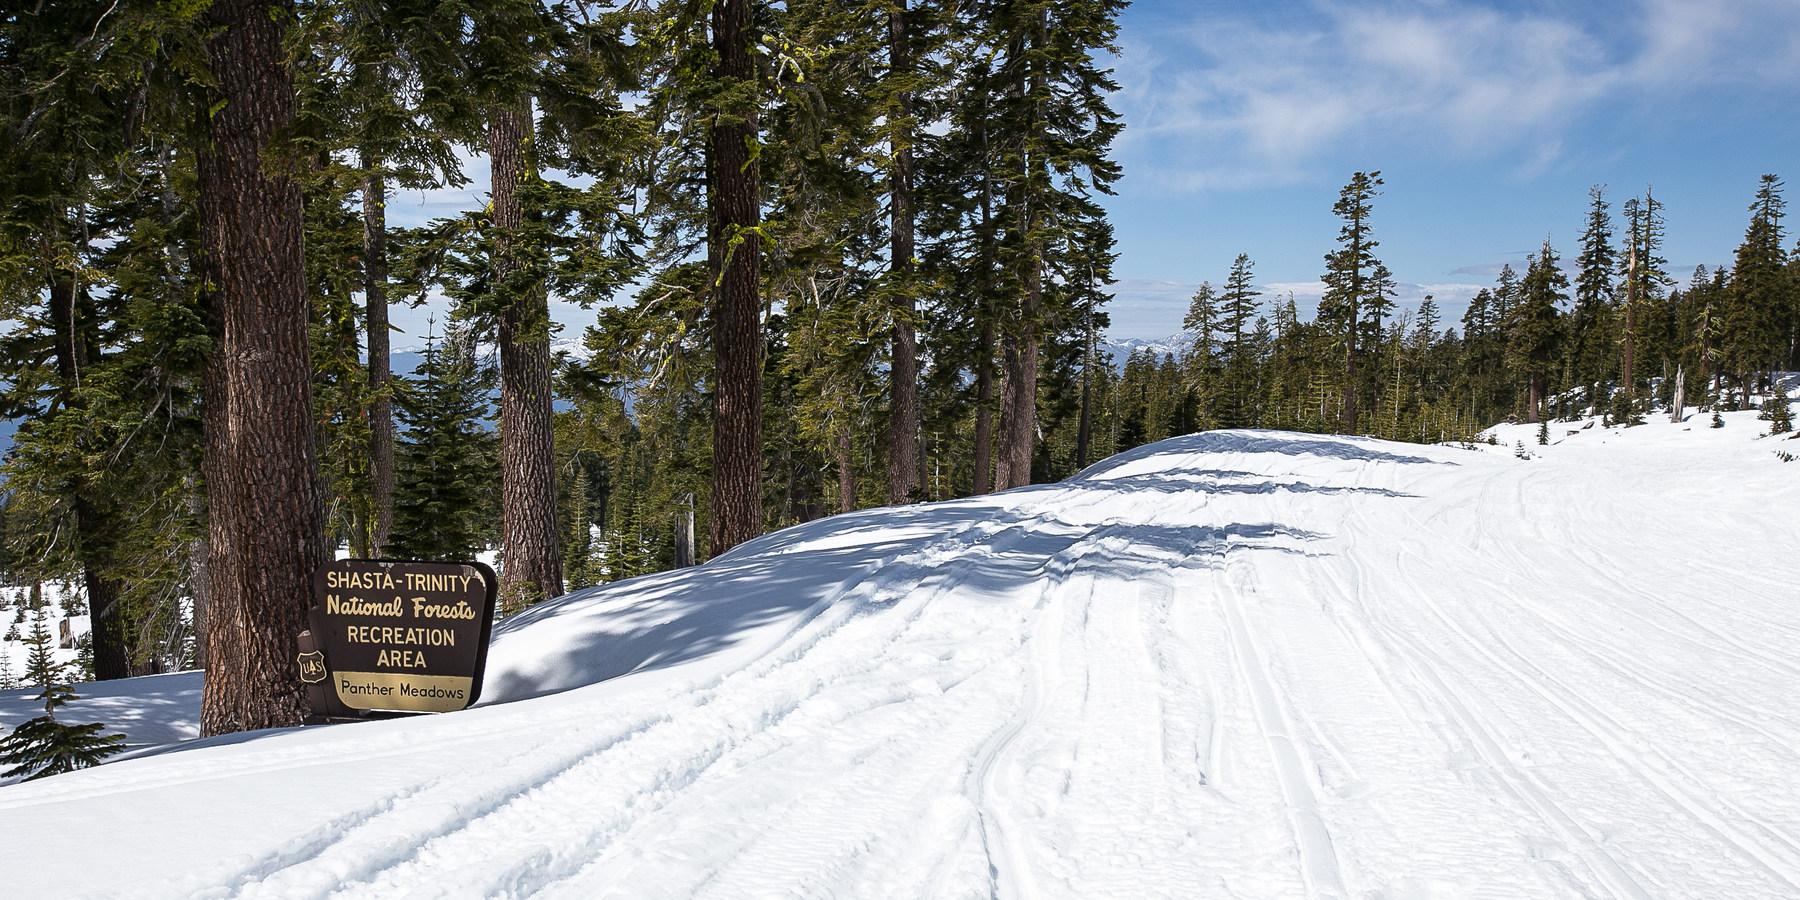 Bunny Flat Snow Shoeing